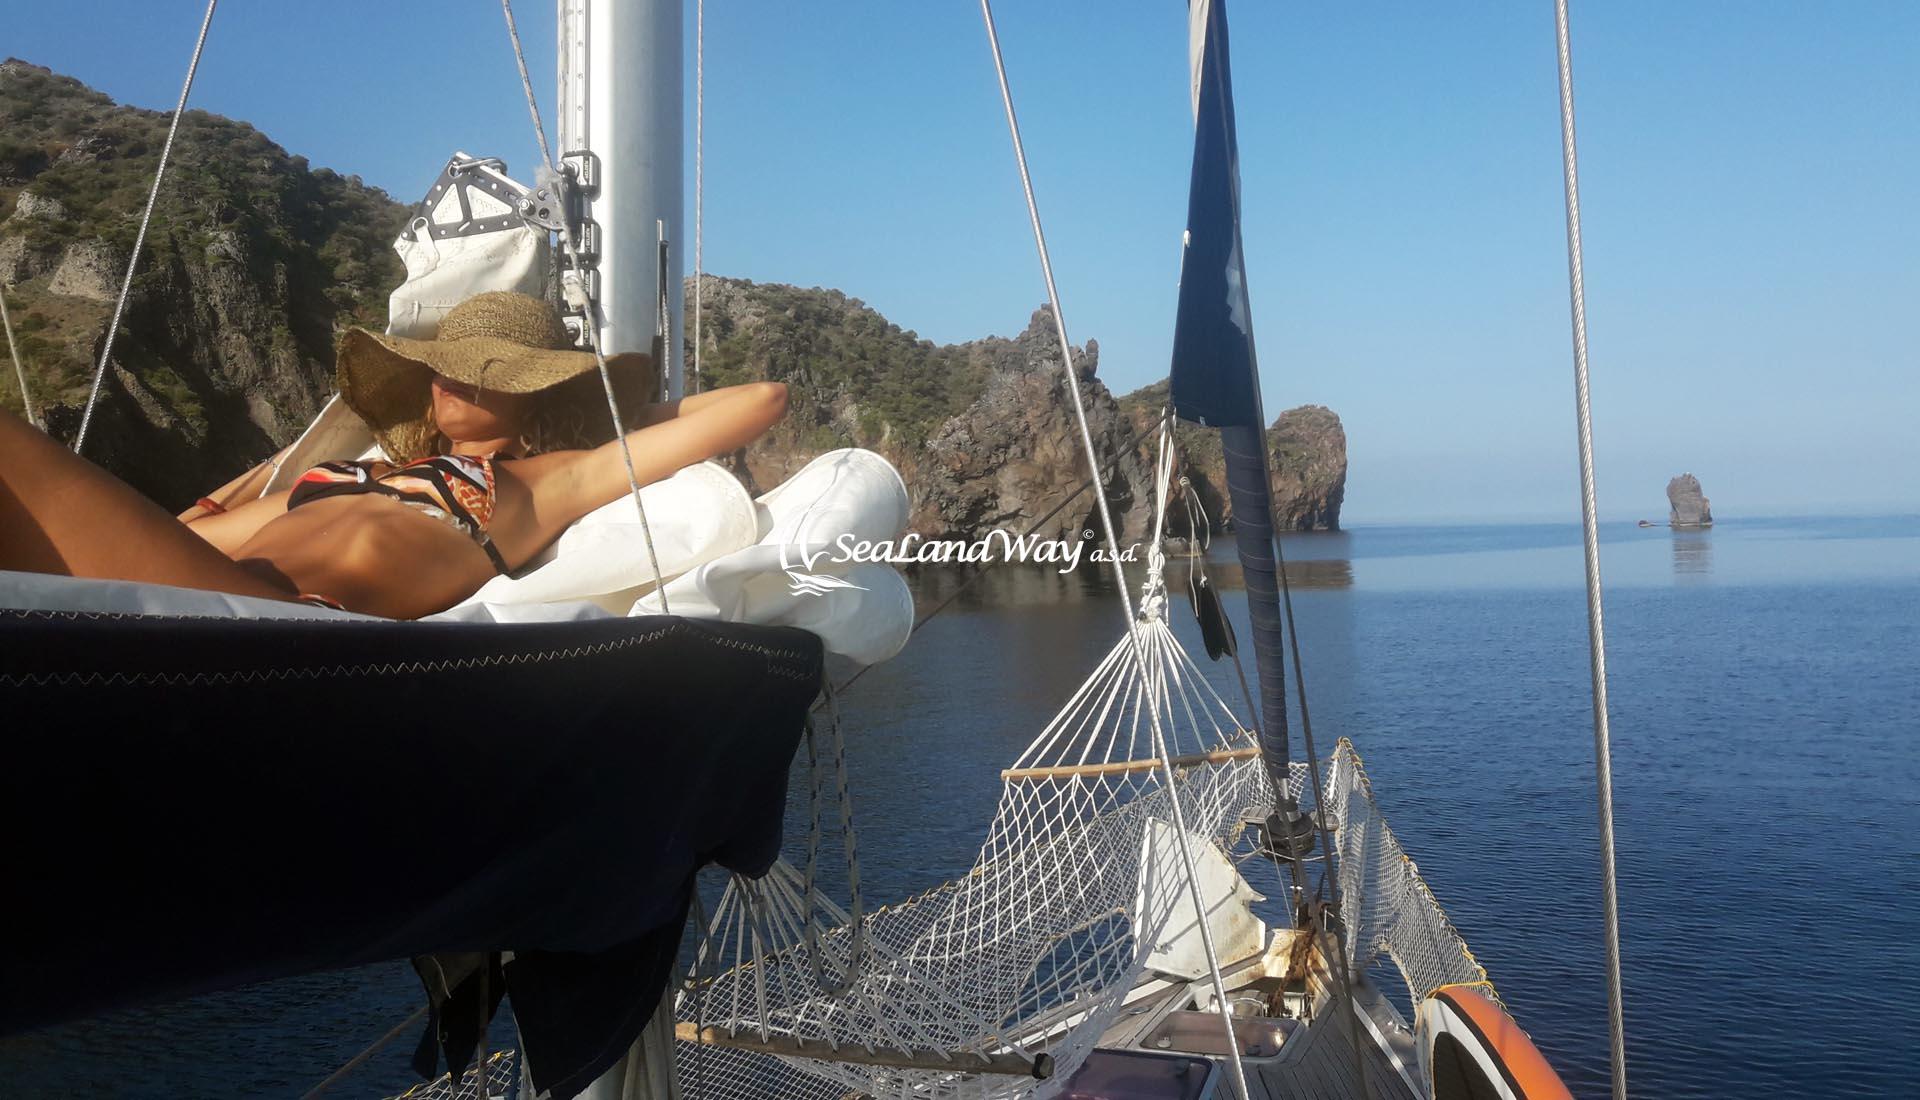 Boma - SeaLandWay Imbarco Individuale Boma - Crociera Vacanza Barca a Vela Aeolian Islands Italy Wedding Team Building